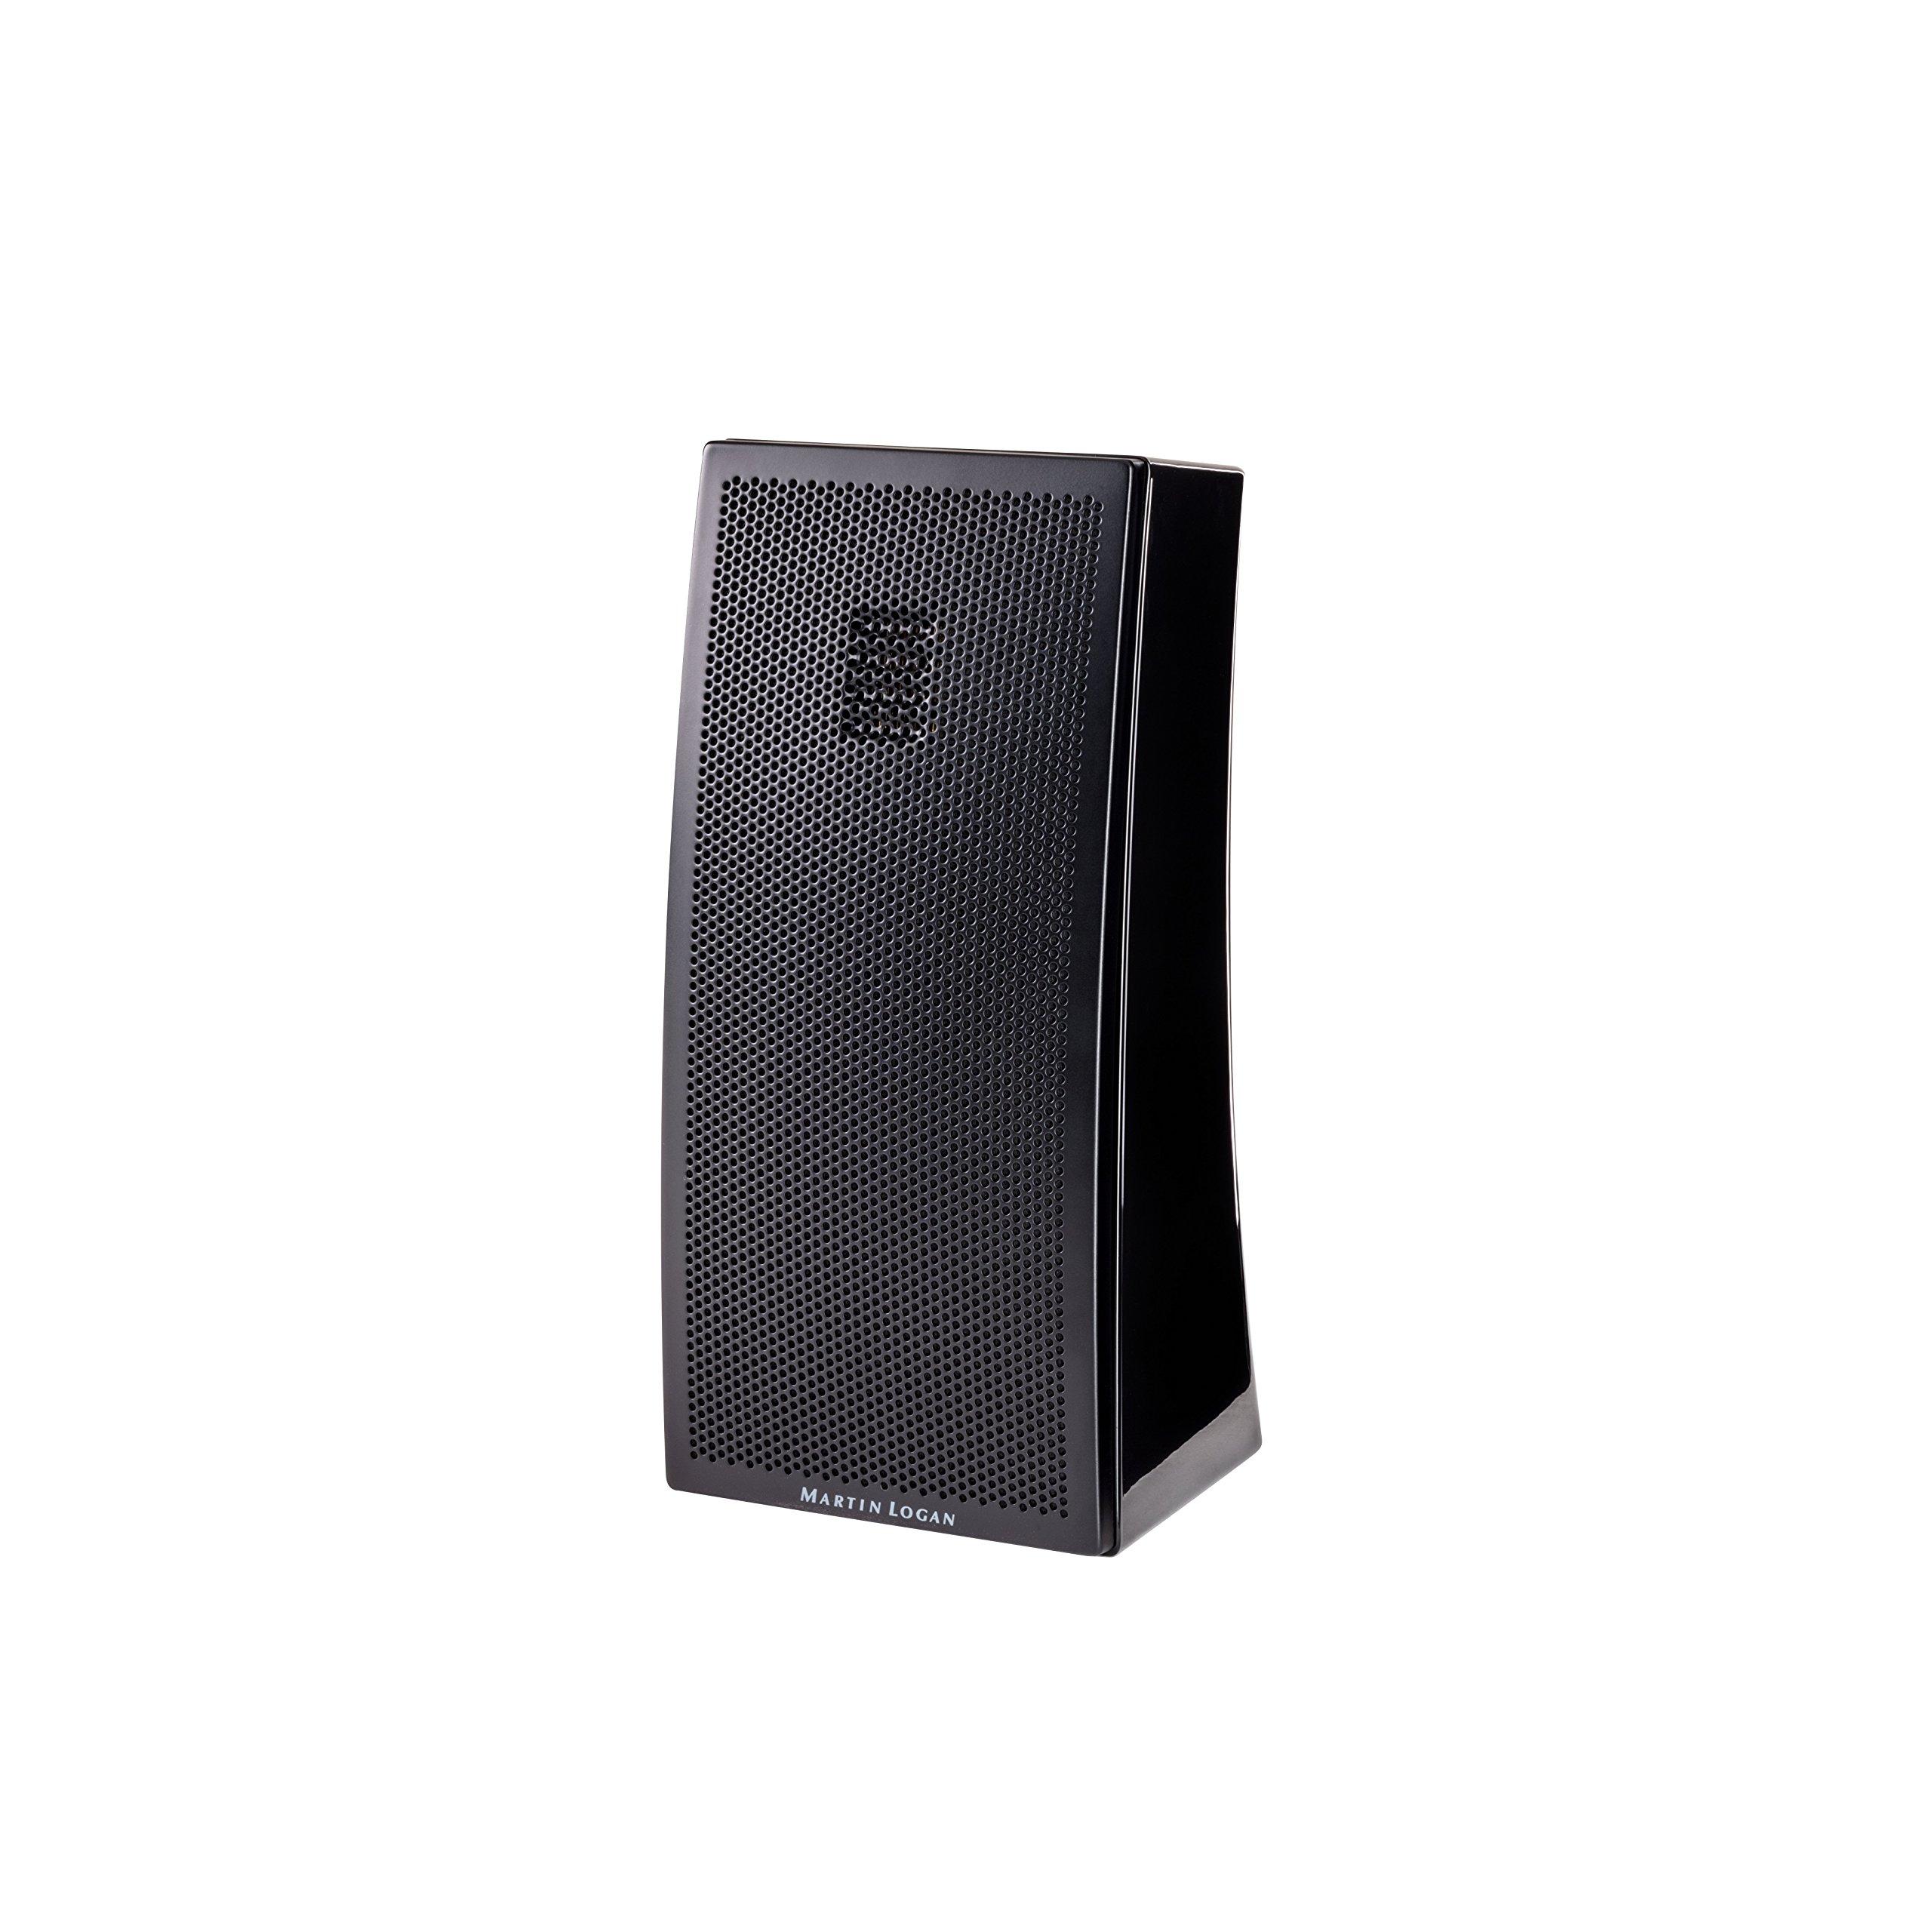 MartinLogan Motion 2i Folded Tweeter Bookshelf Speaker (±3dB, Gloss Black)